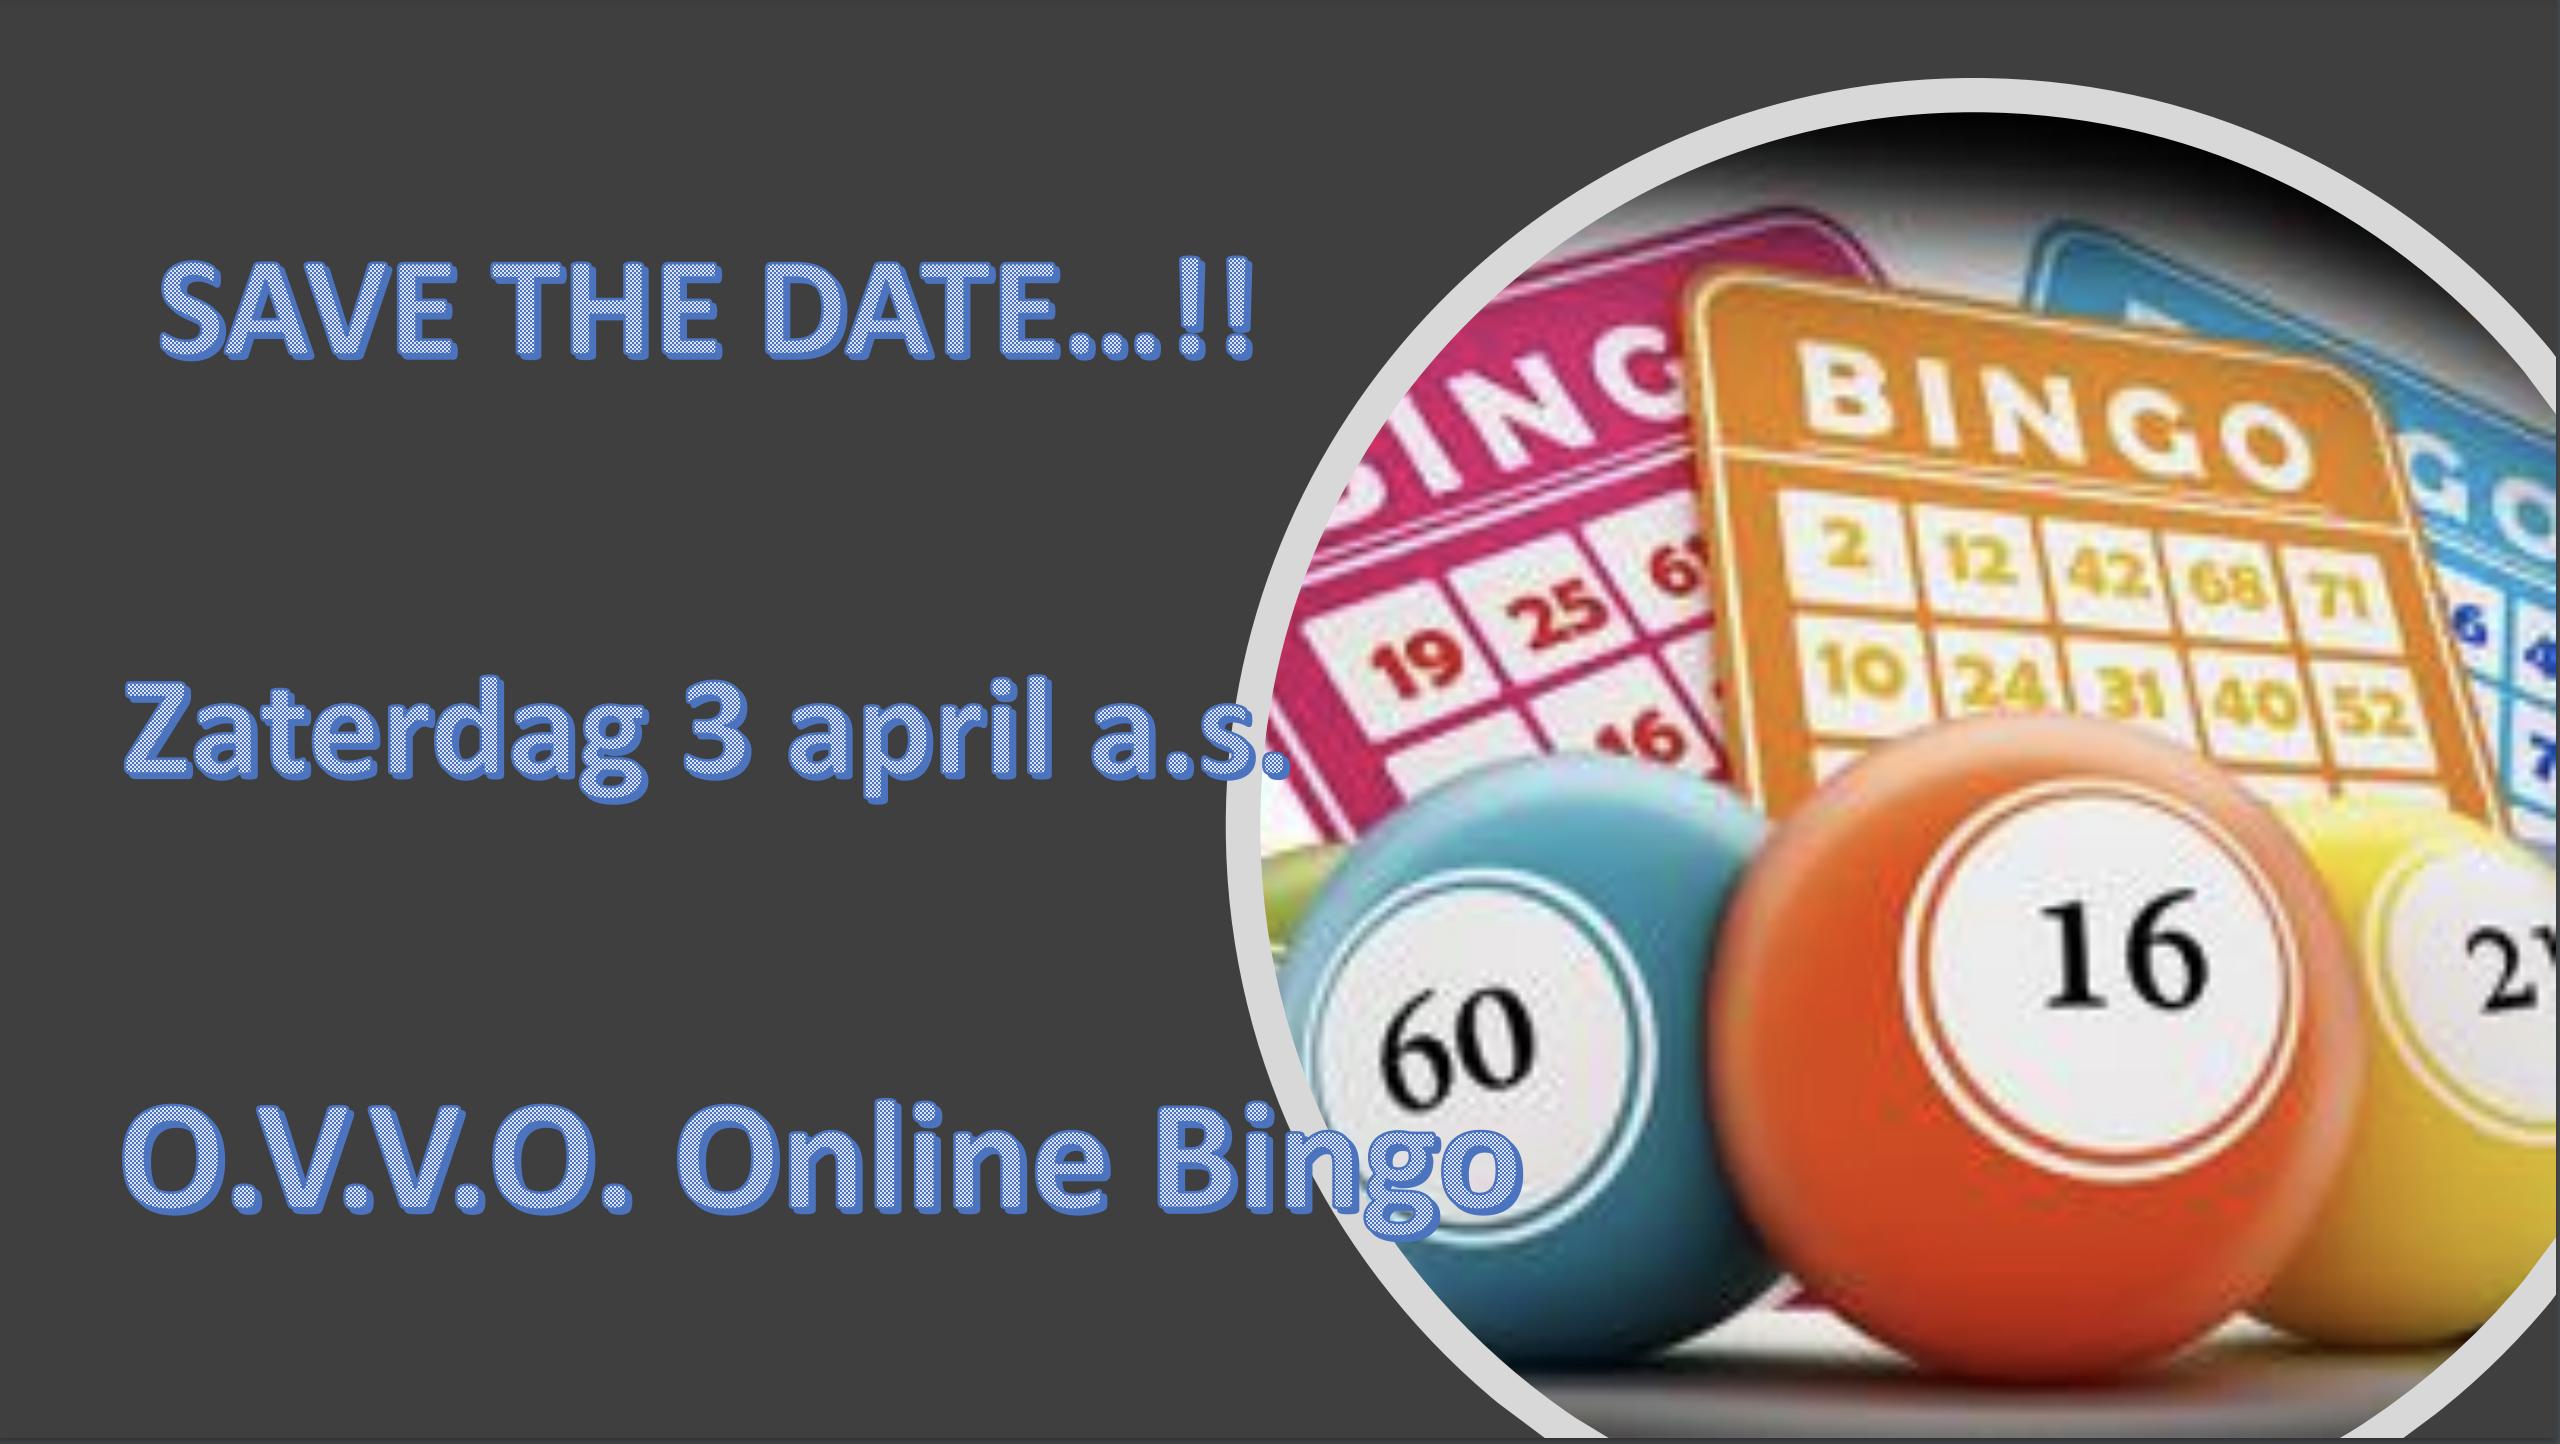 OVVO Online Bingo